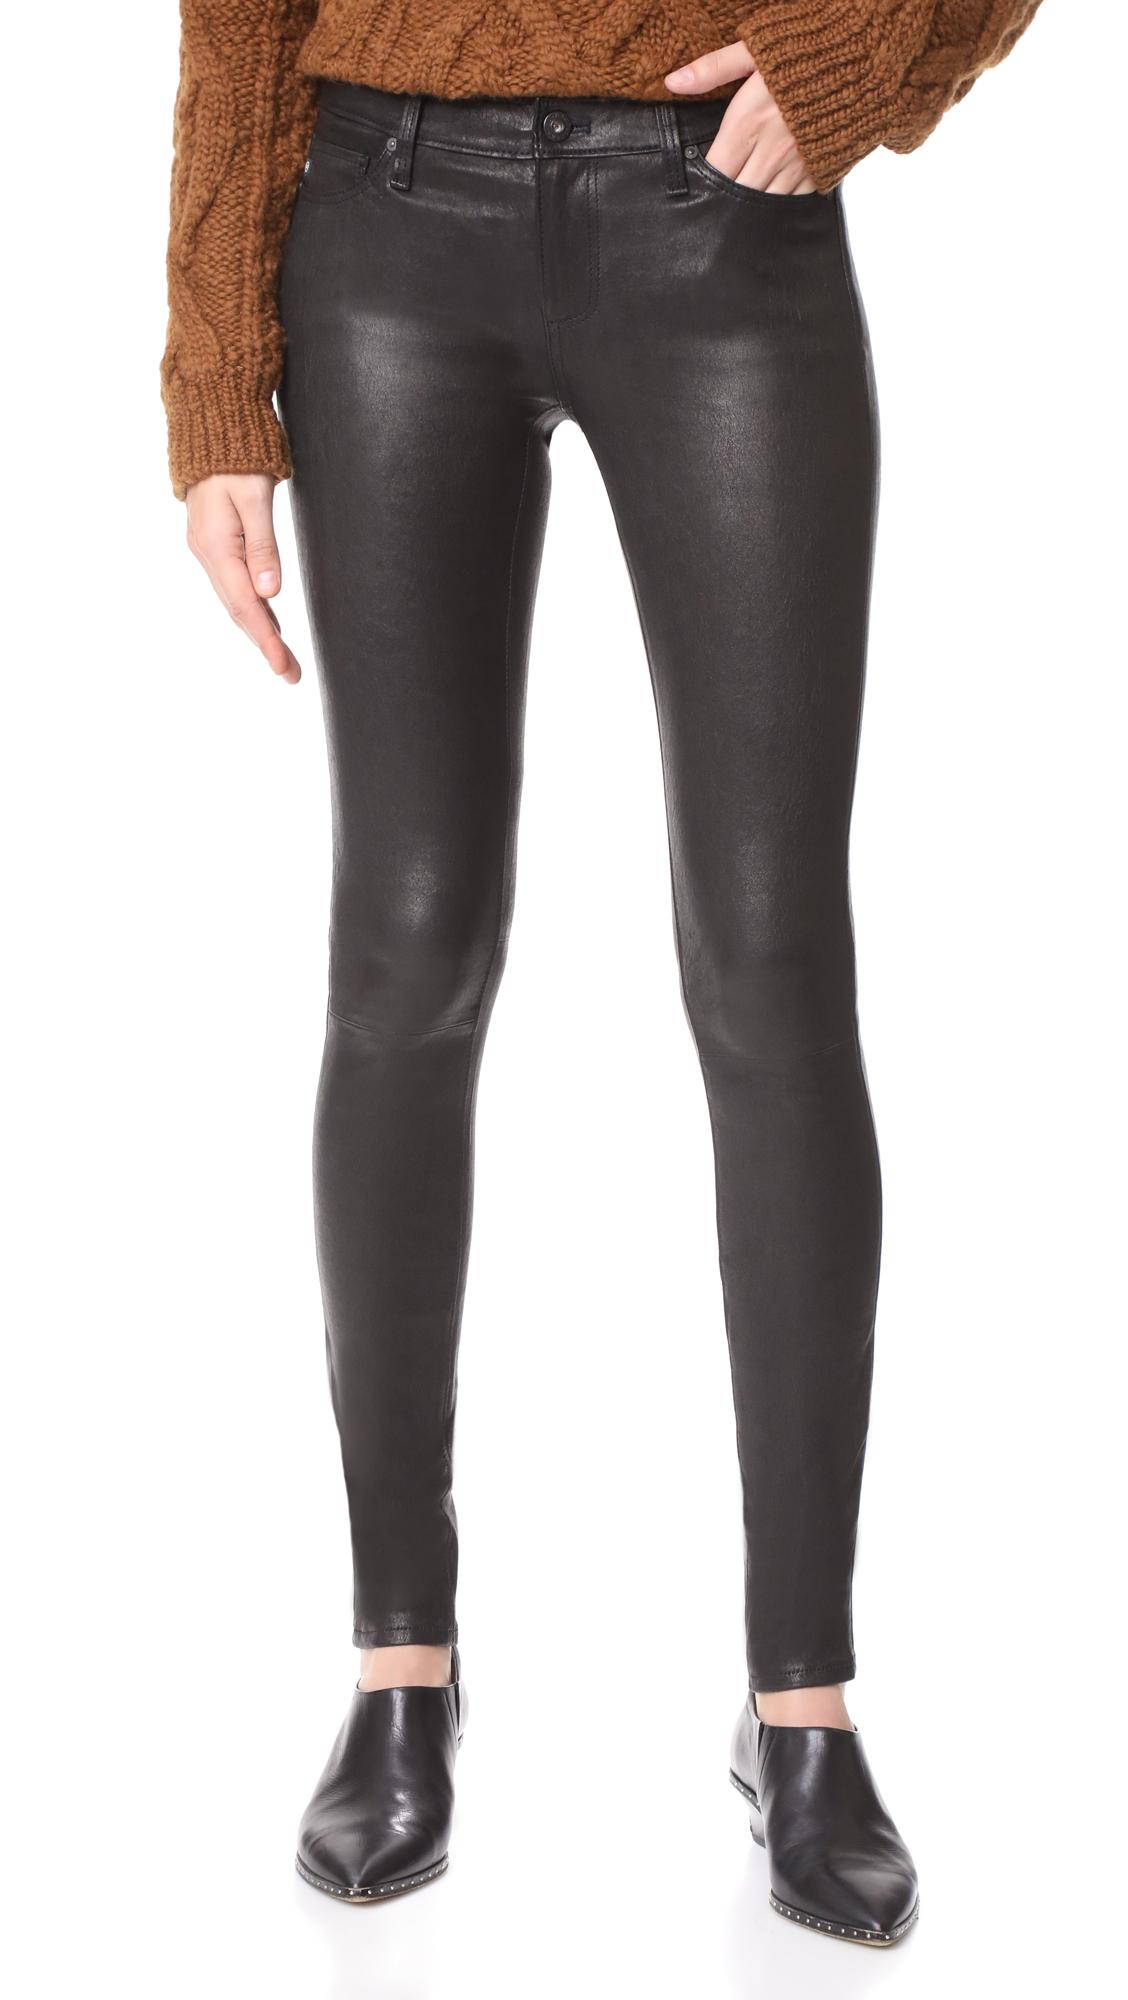 AG The Skinny Leather Pants - Super Black